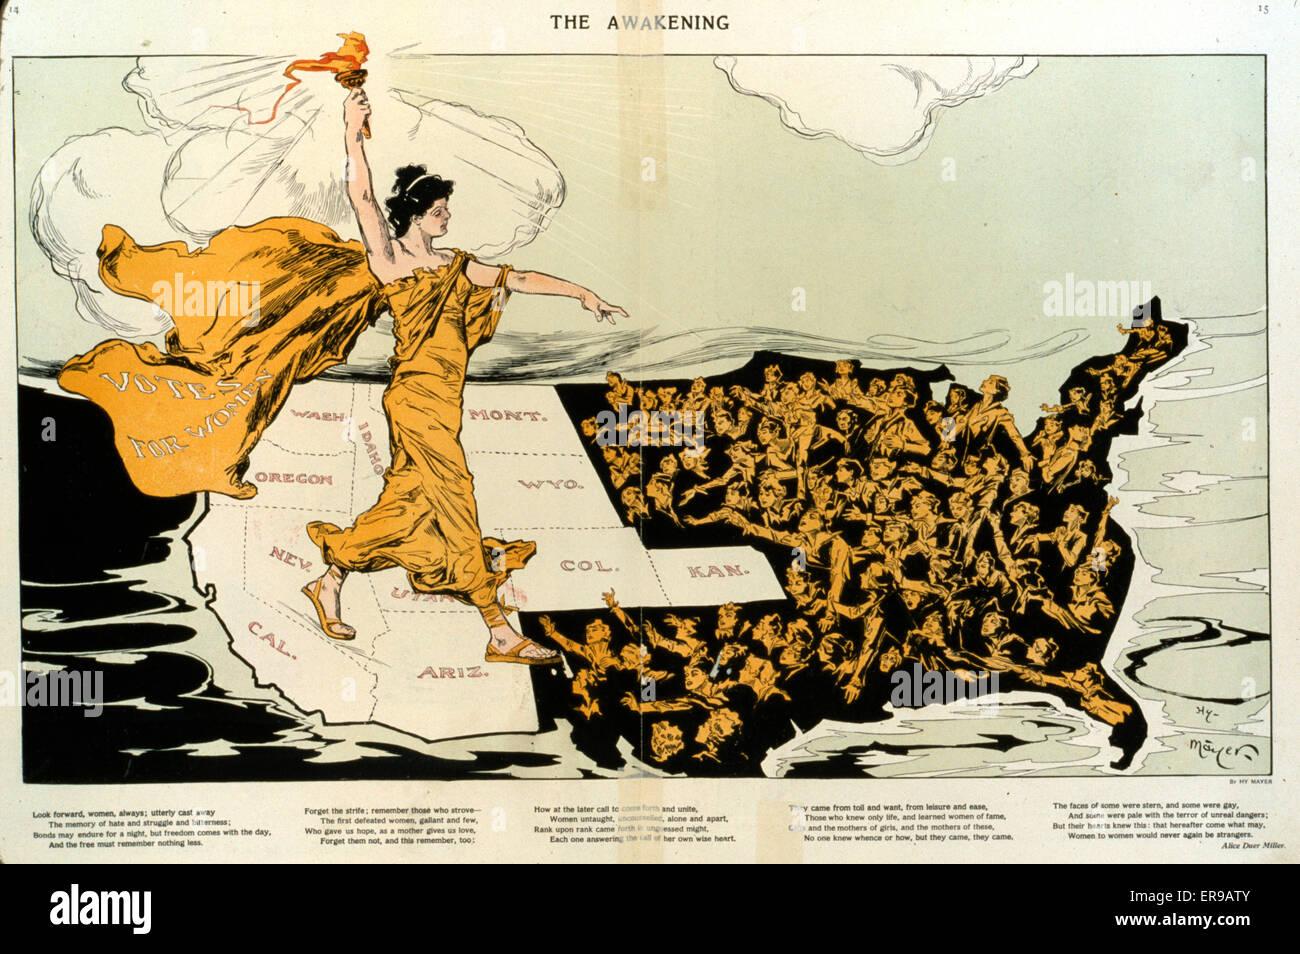 The awakening. Illustration shows a torch-bearing female labeled Votes for Women, symbolizing the awakening of the - Stock Image